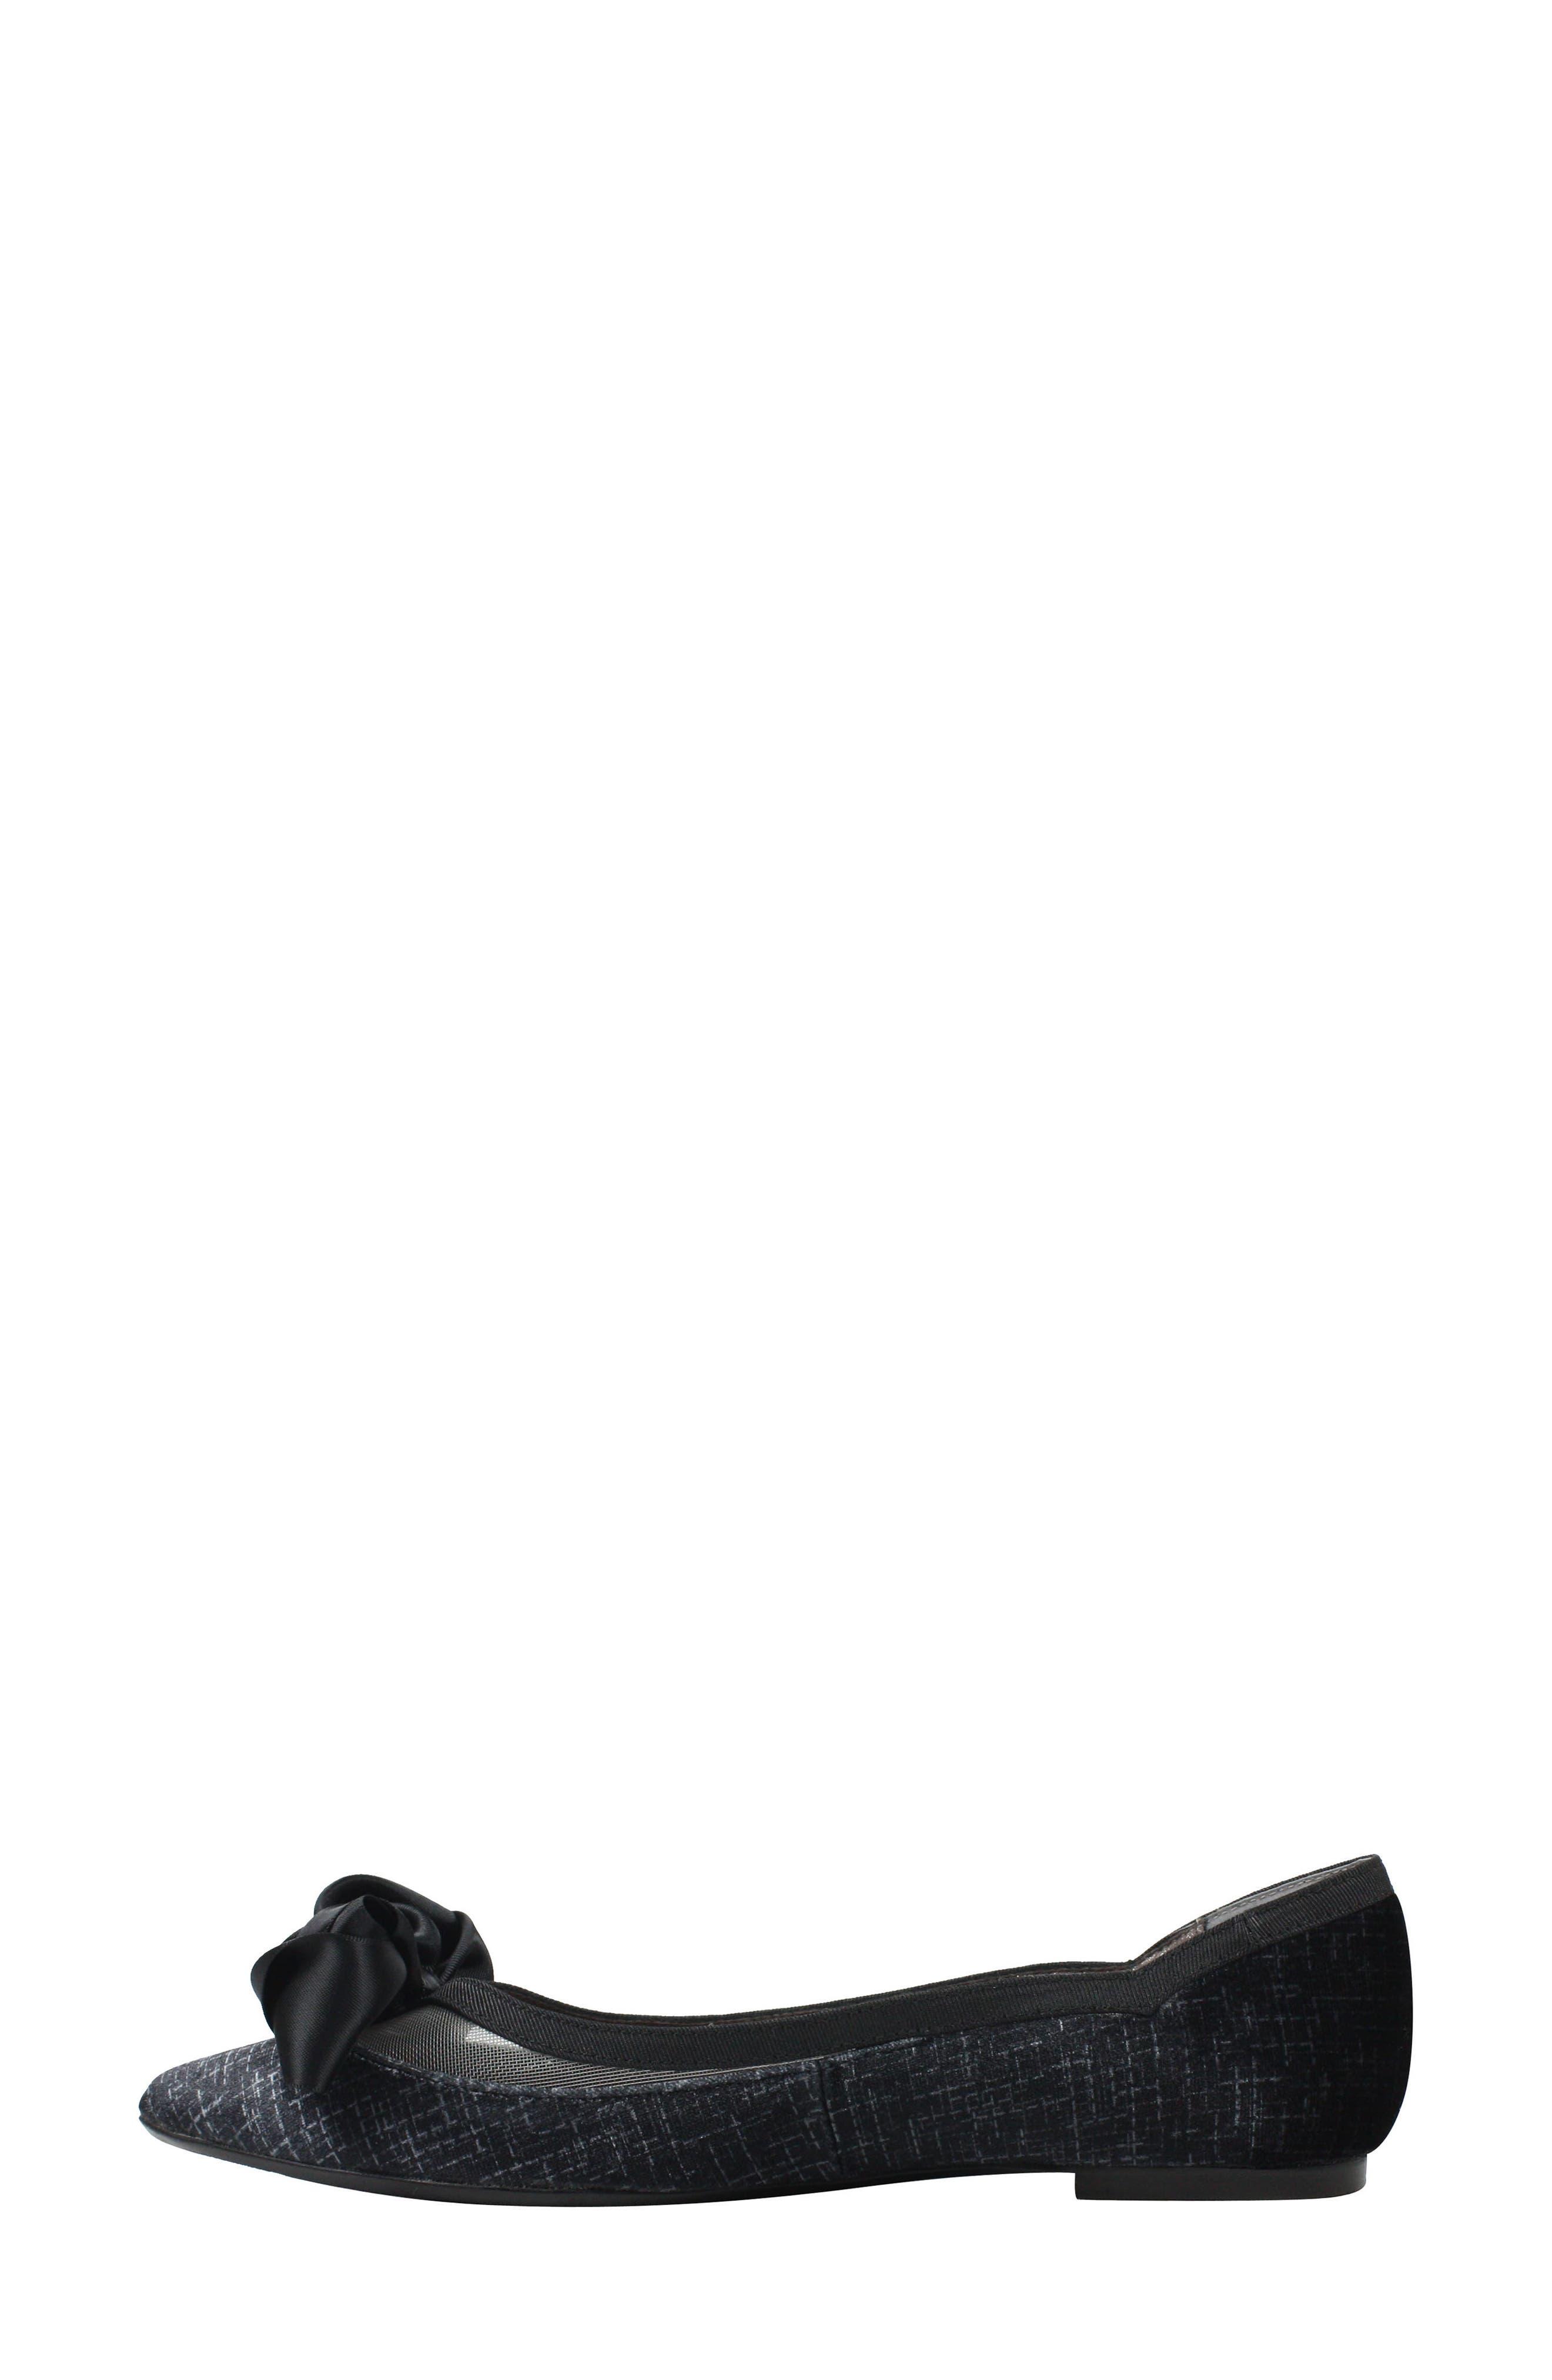 Allitson Bow Flat,                             Alternate thumbnail 7, color,                             TAUPE/ BLACK